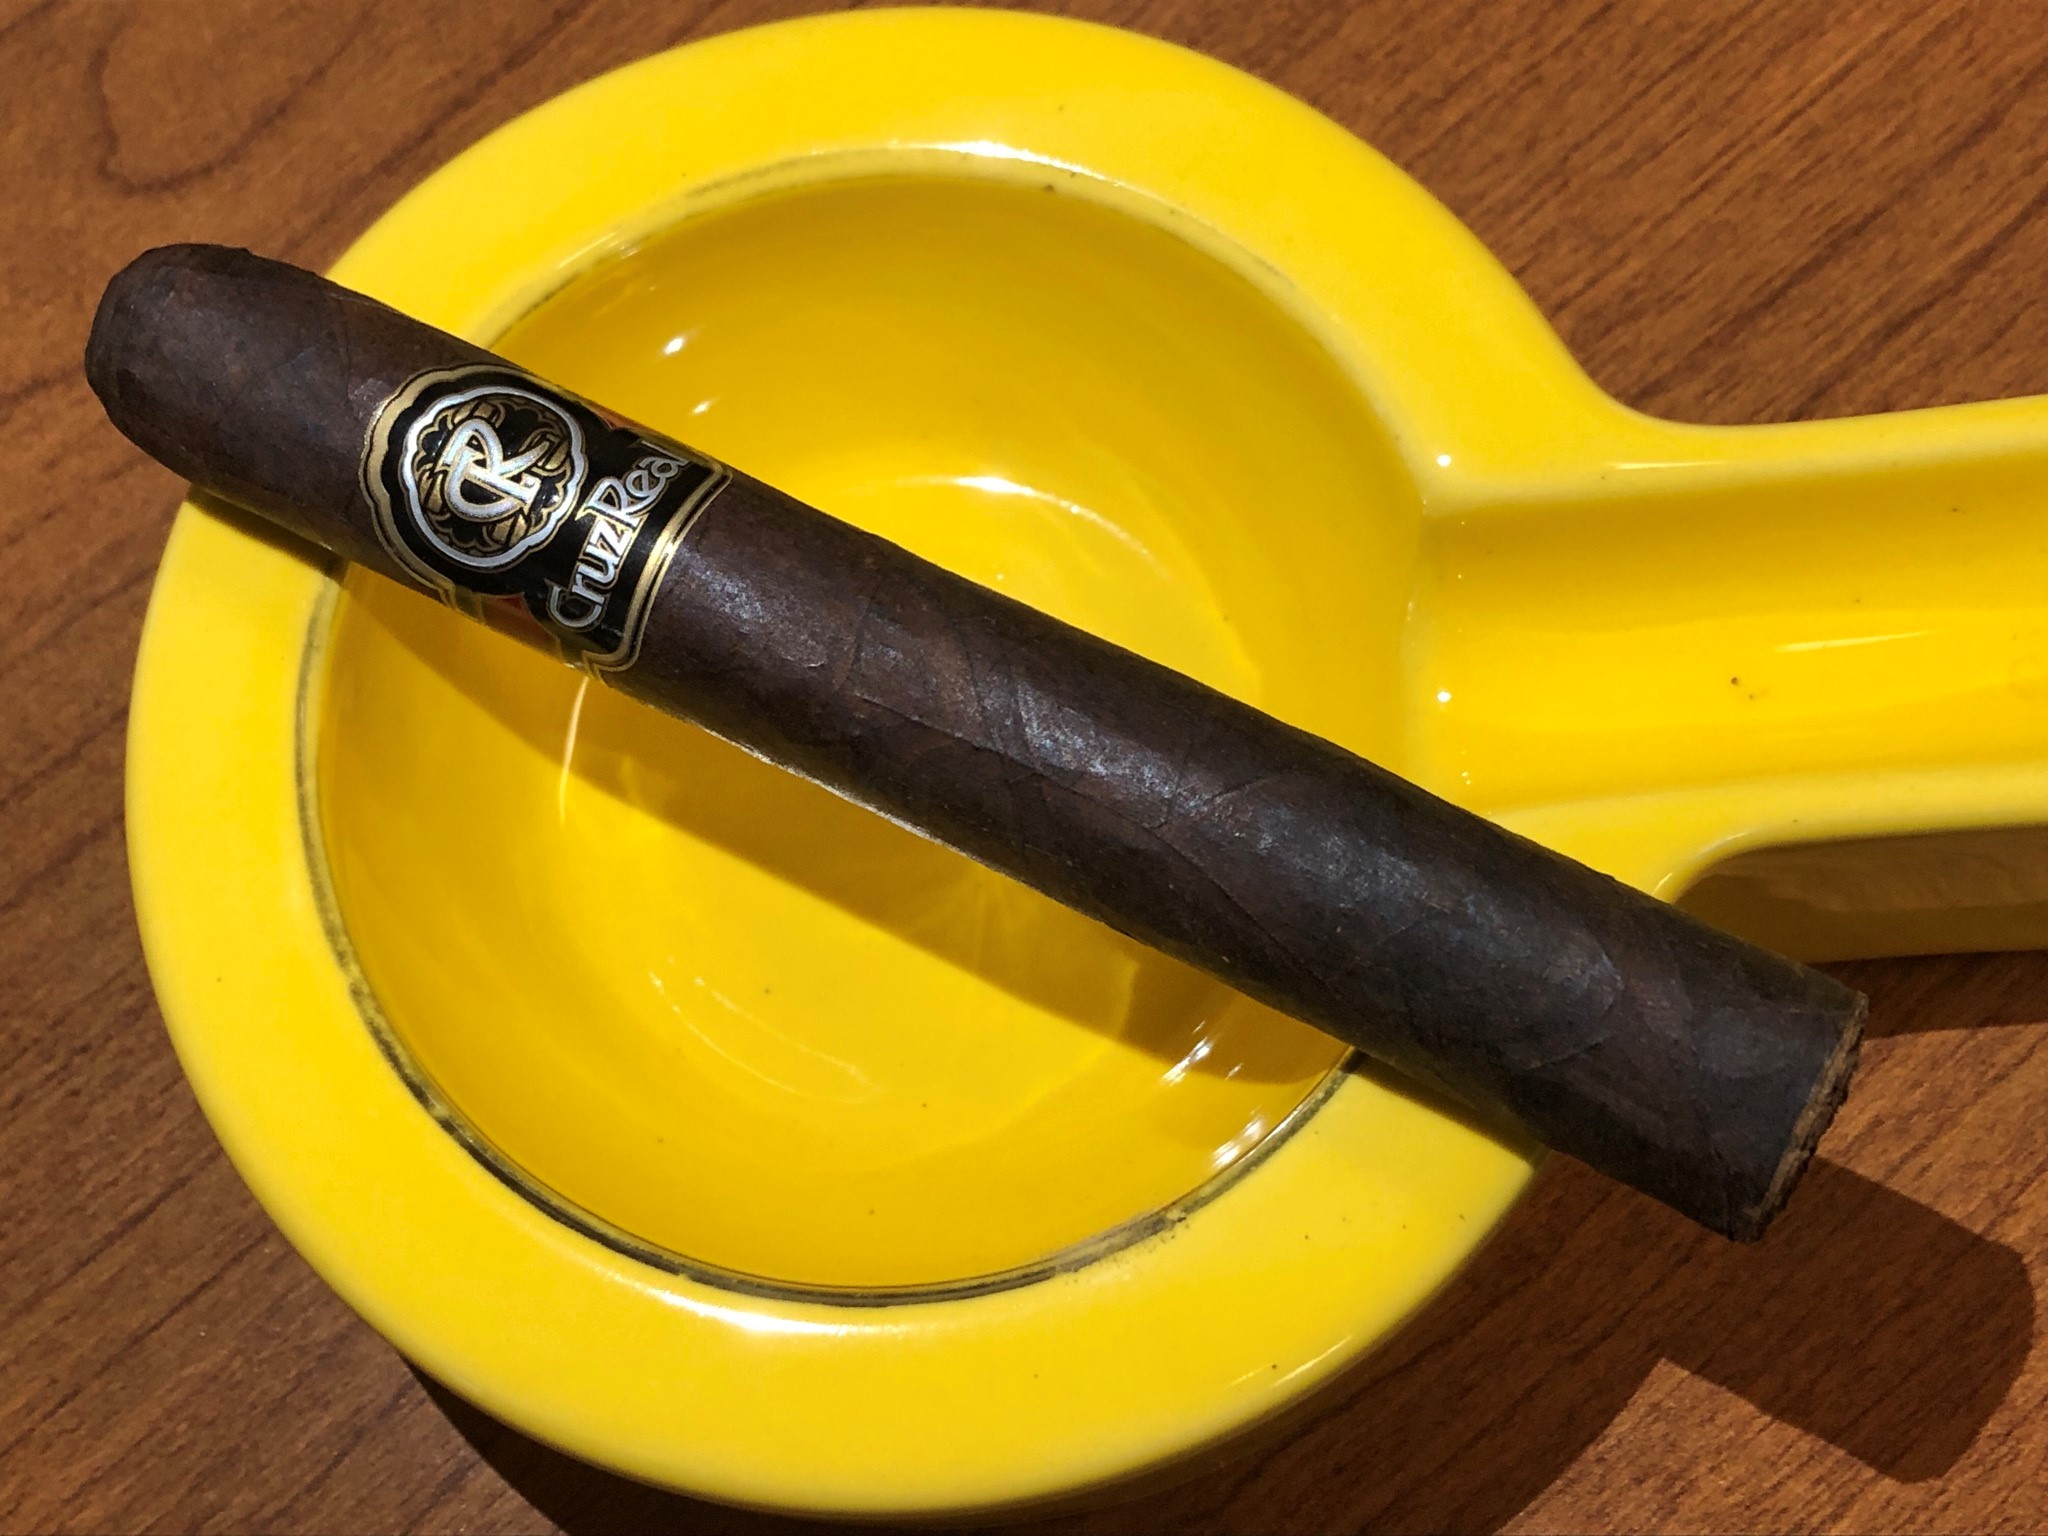 alec bradley cigars guide Cruz Real Maduro toro cigar review by Jared Gulick